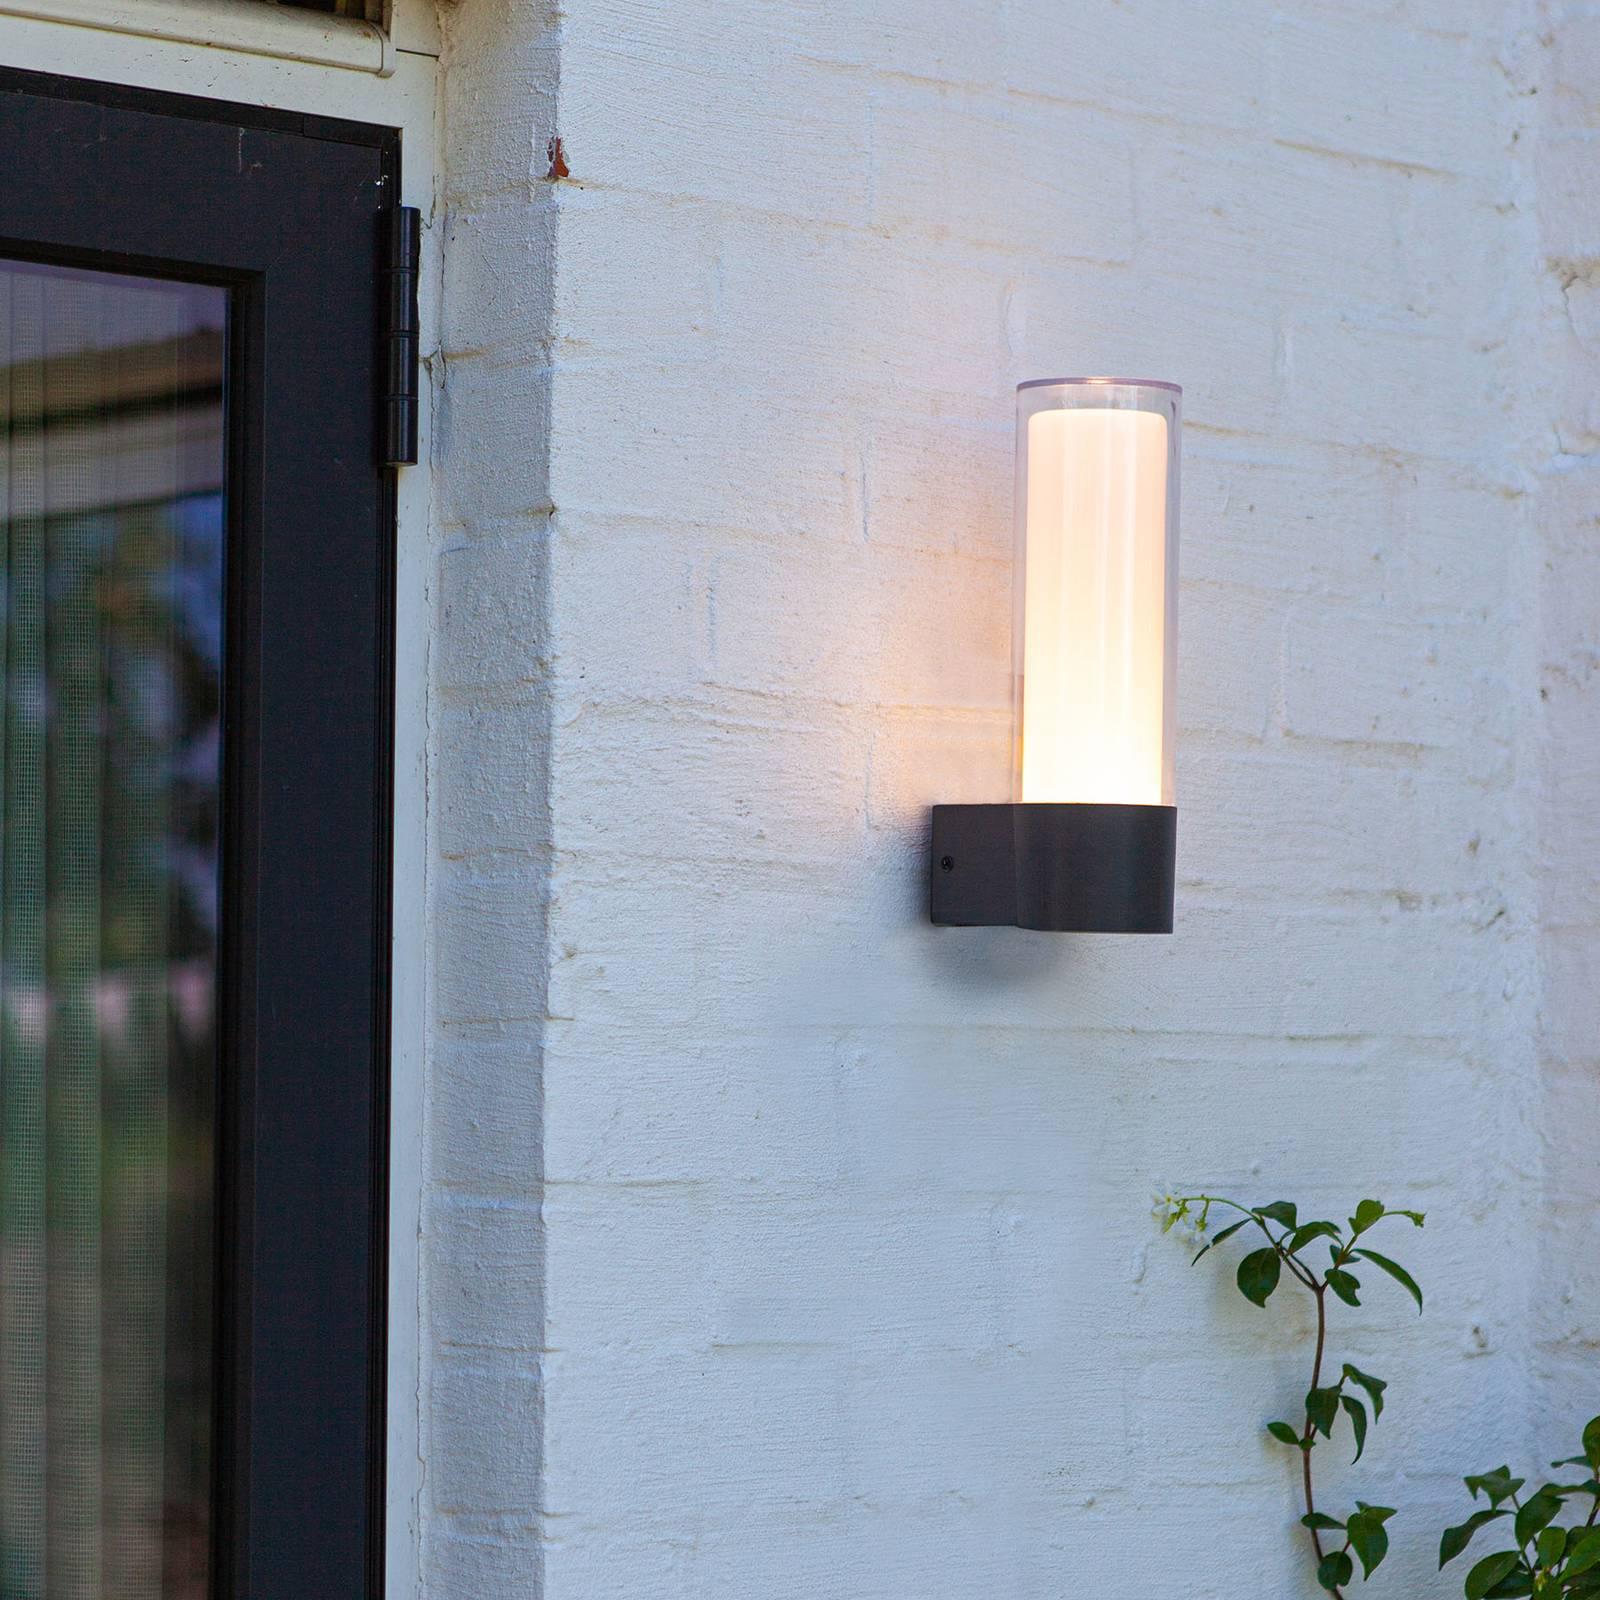 LED-ulkoseinälamppu Dropa, RGBW, älykäs ohjaus